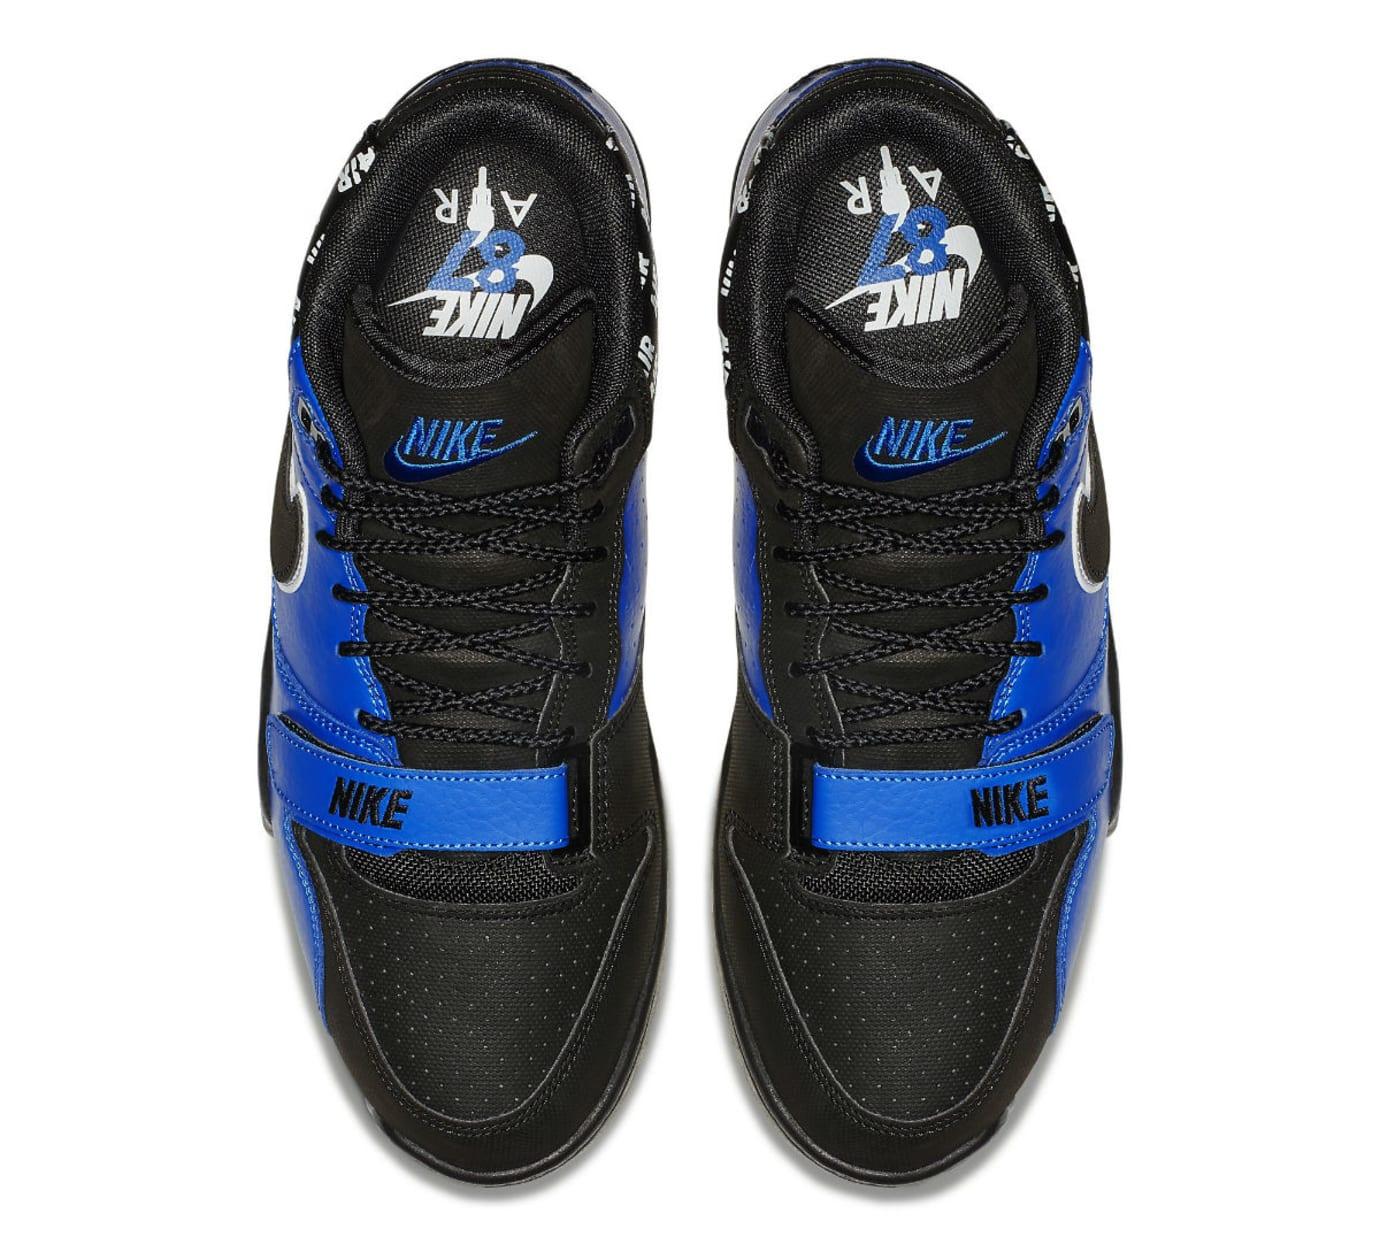 online store 36830 1ad58 Image via Nike Nike Air Trainer 1 SOA Hyper Cobalt Release Date AQ5099-400  Top